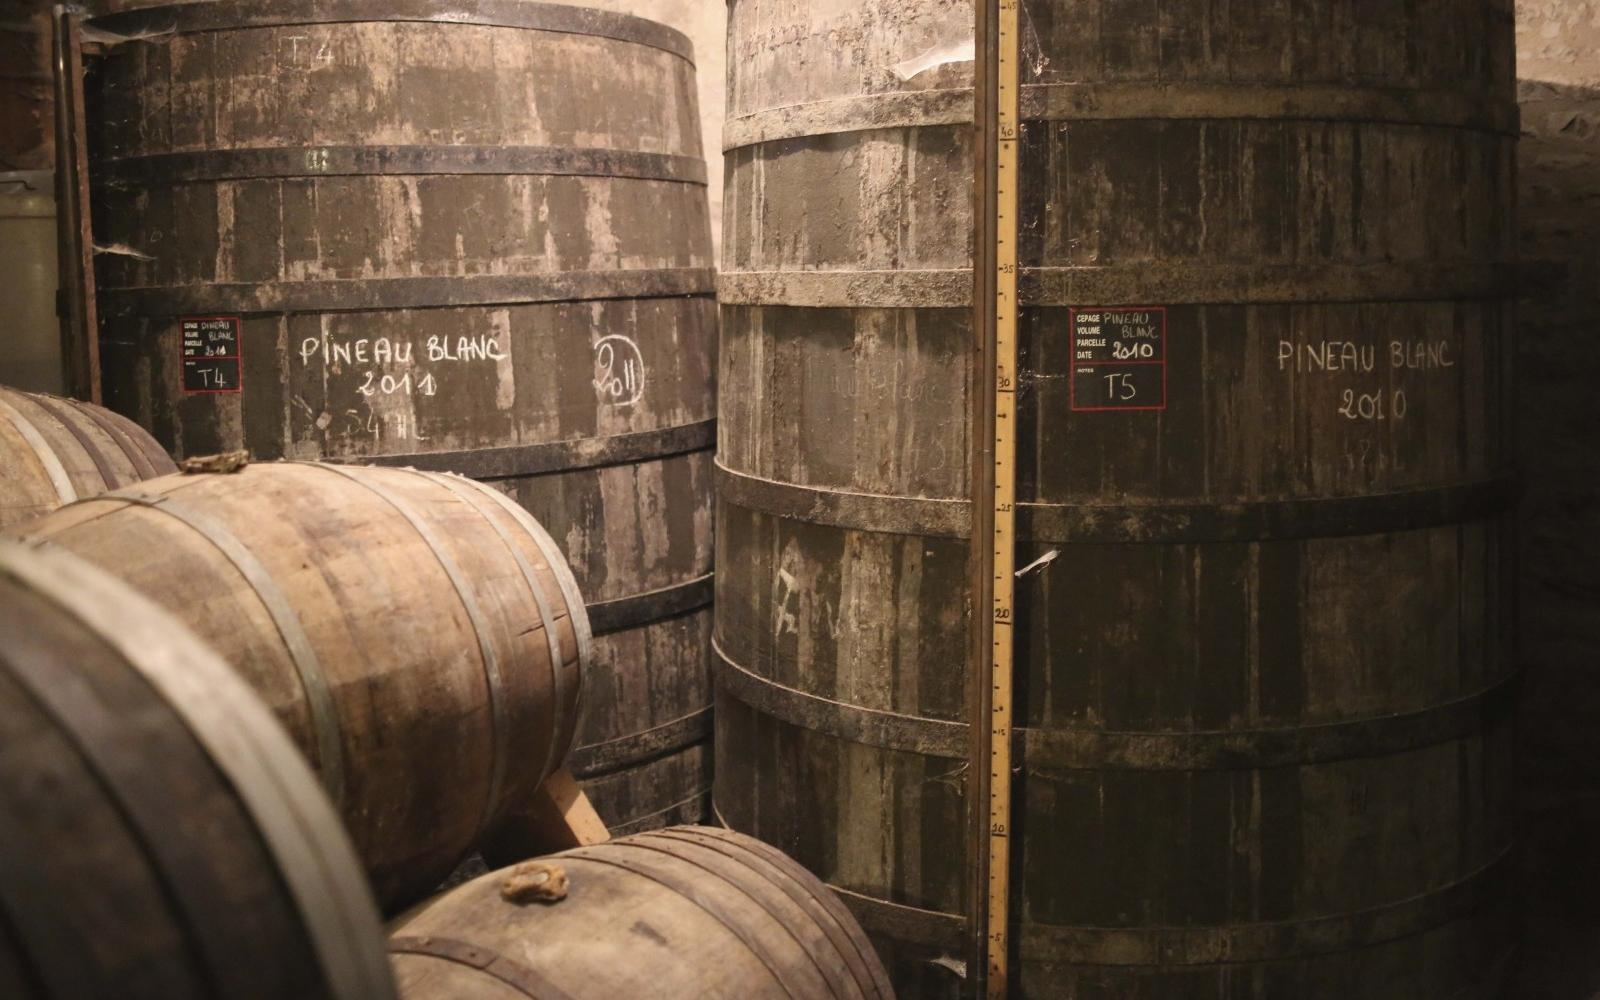 Pineau des Charentes is matured in oak barrels.